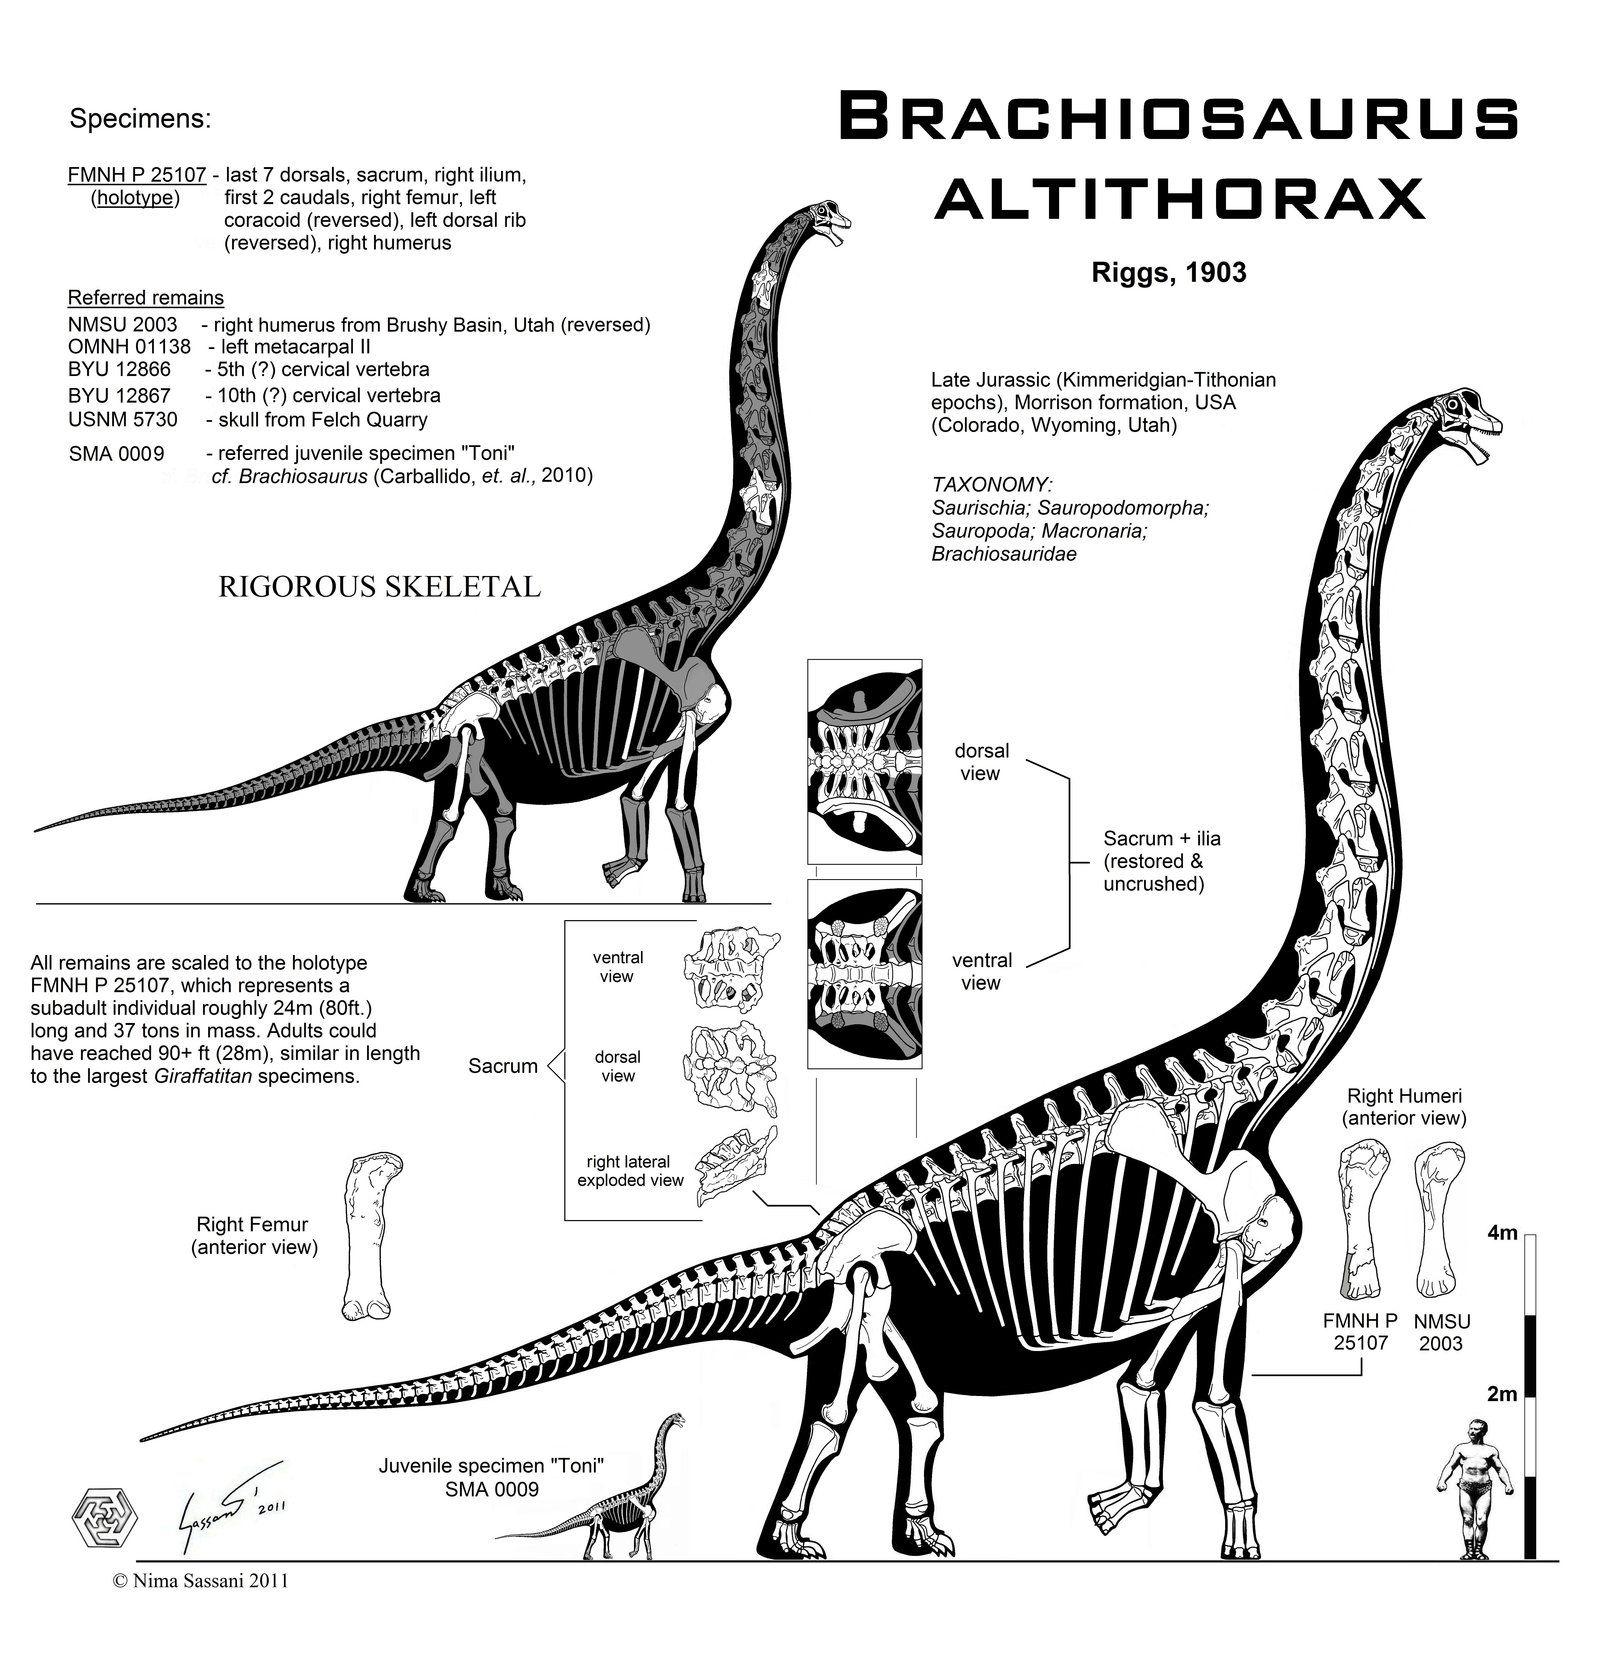 Brachiosaurus altithorax hi-fi skeletal by ~Paleo-King